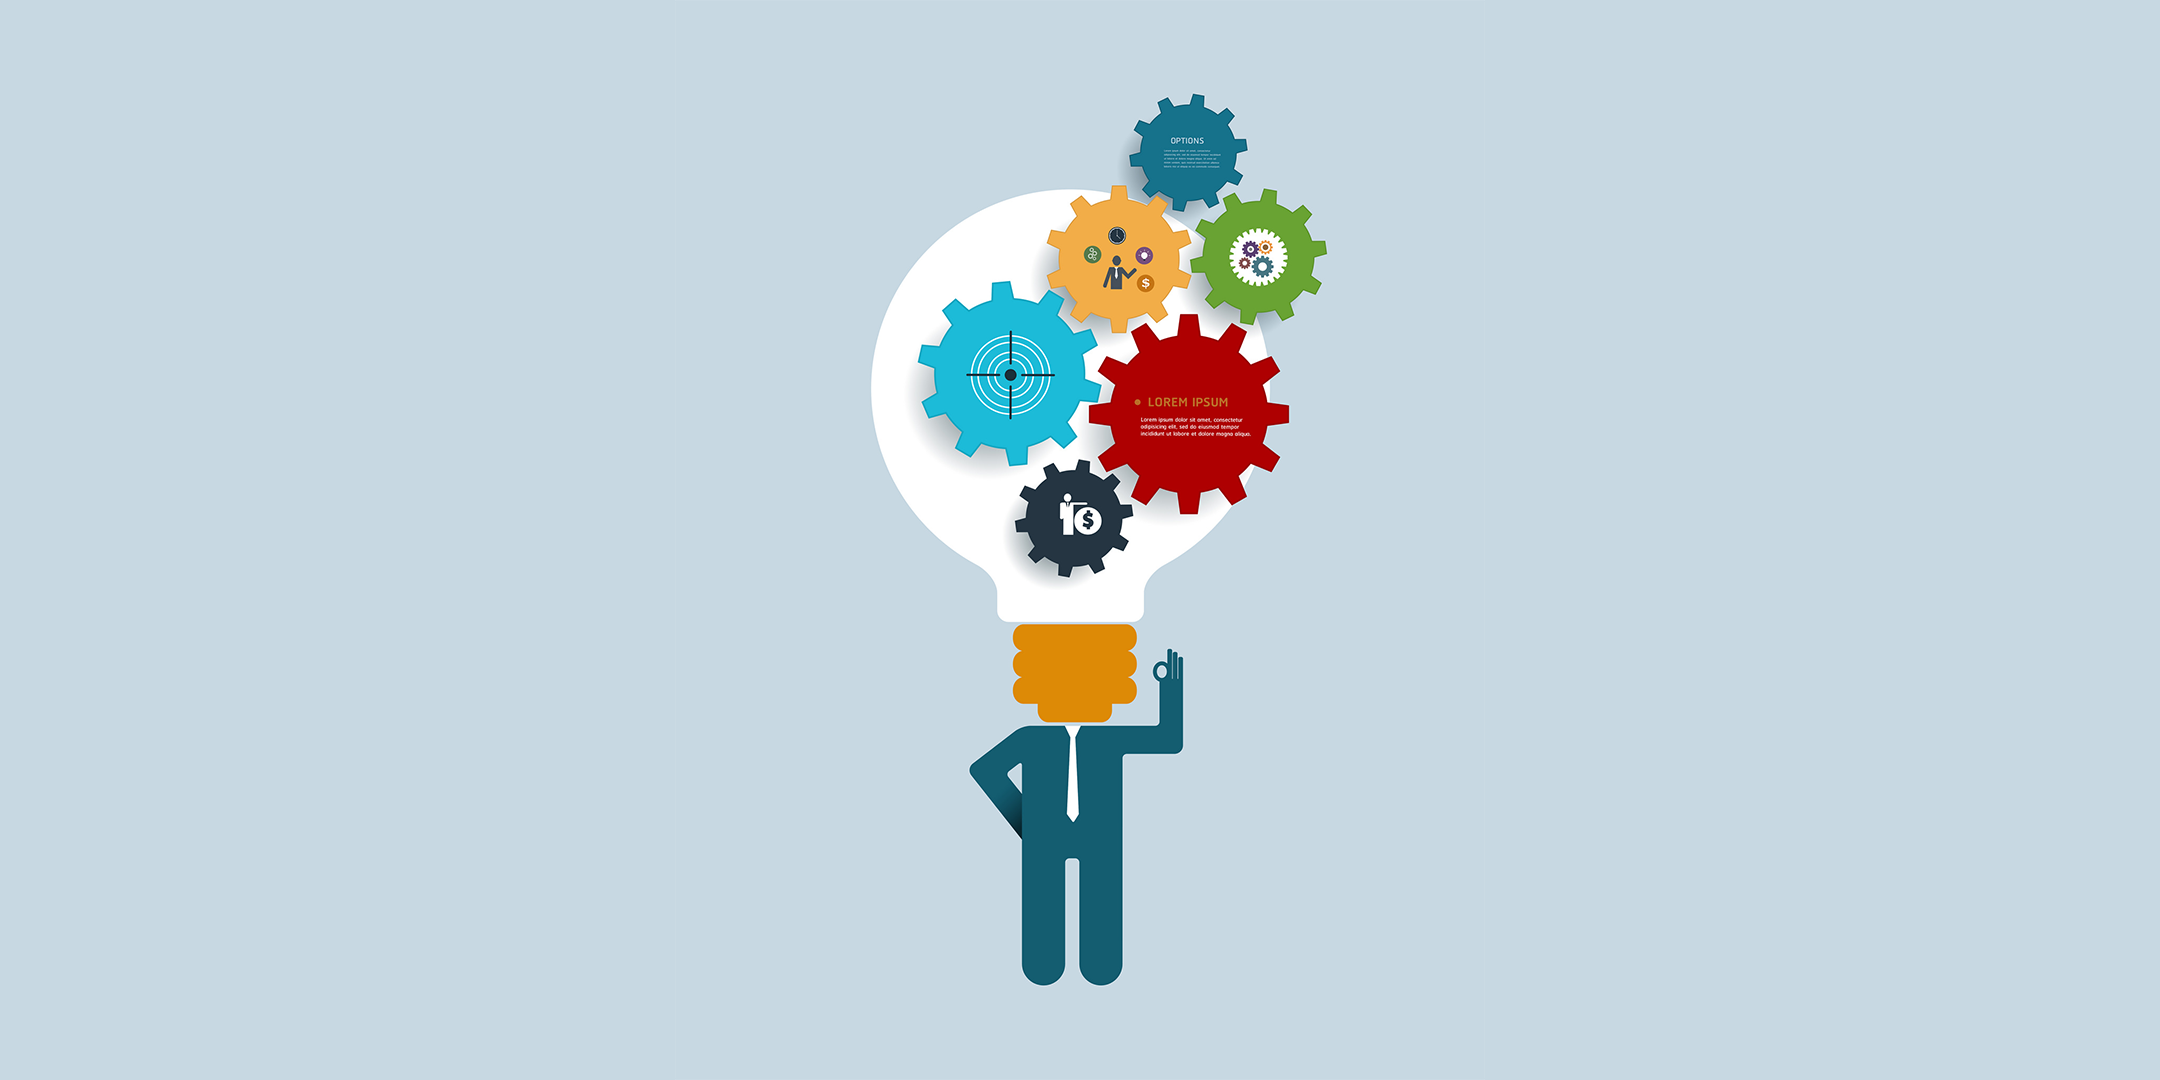 1:1 Drop-in consultancy with GetSet (Marketin